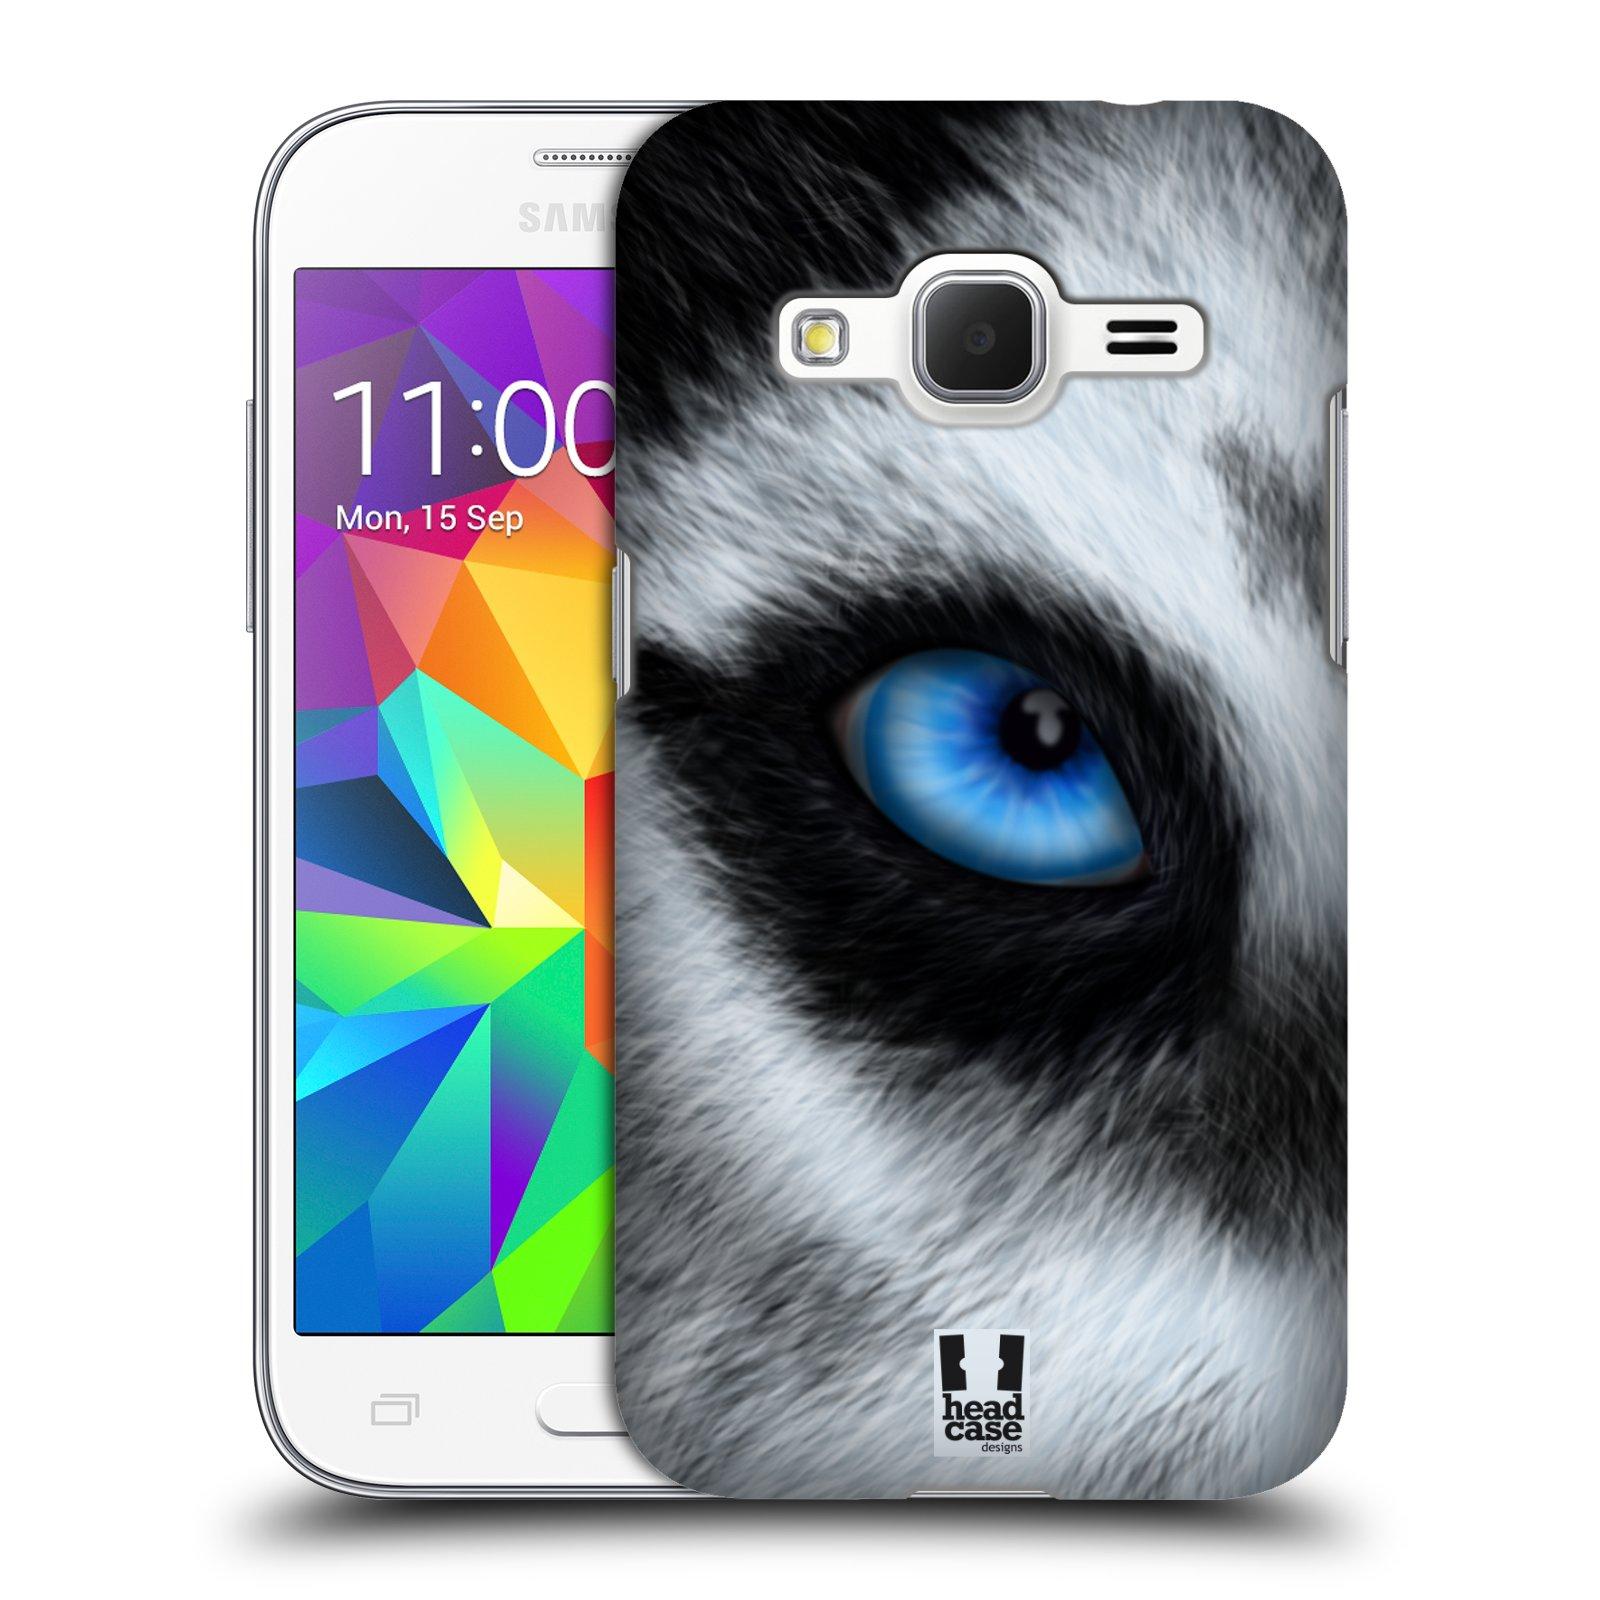 HEAD CASE plastový obal na mobil SAMSUNG GALAXY Core Prime (Core Prime VE) vzor pohled zvířete oko pes husky